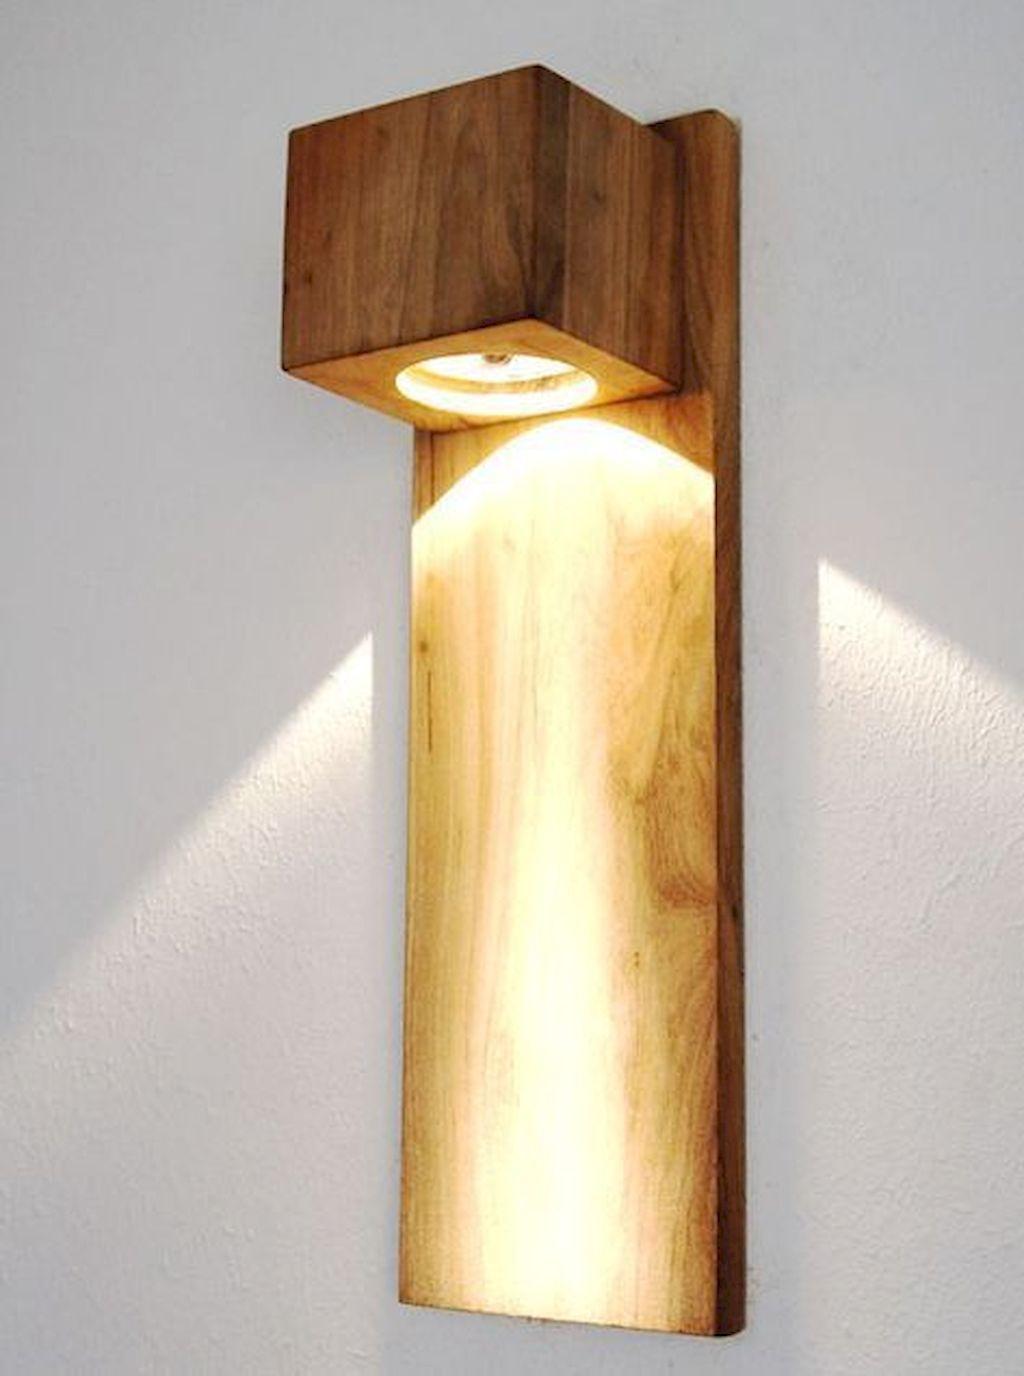 Adorable 85 Inspiring DIY Wooden Lamps Decorating Ideas